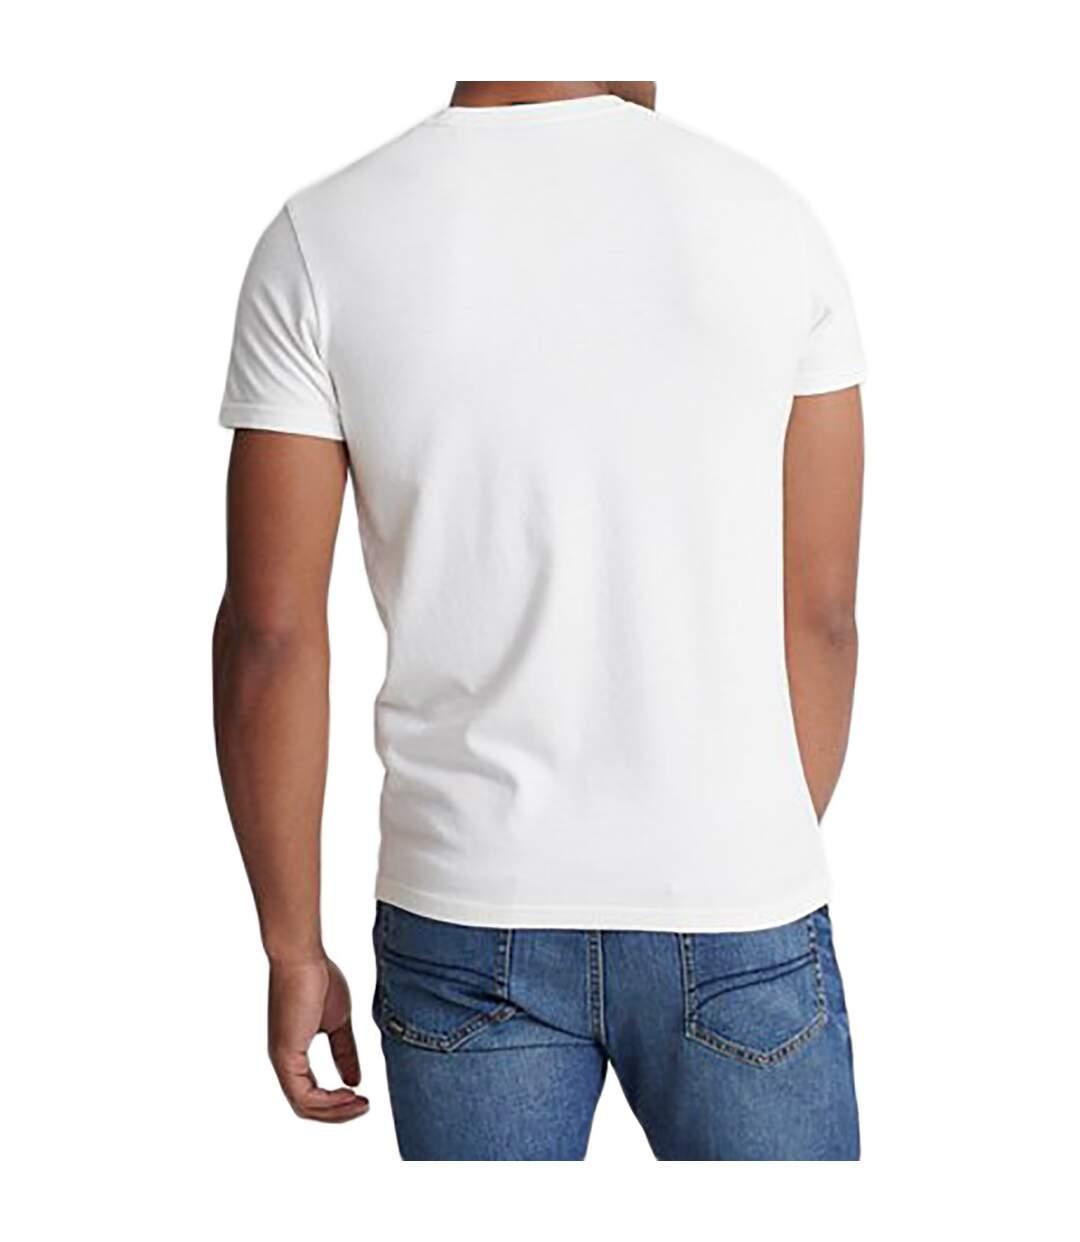 Tee Shirt SuperDry Vl Shop Bondeed